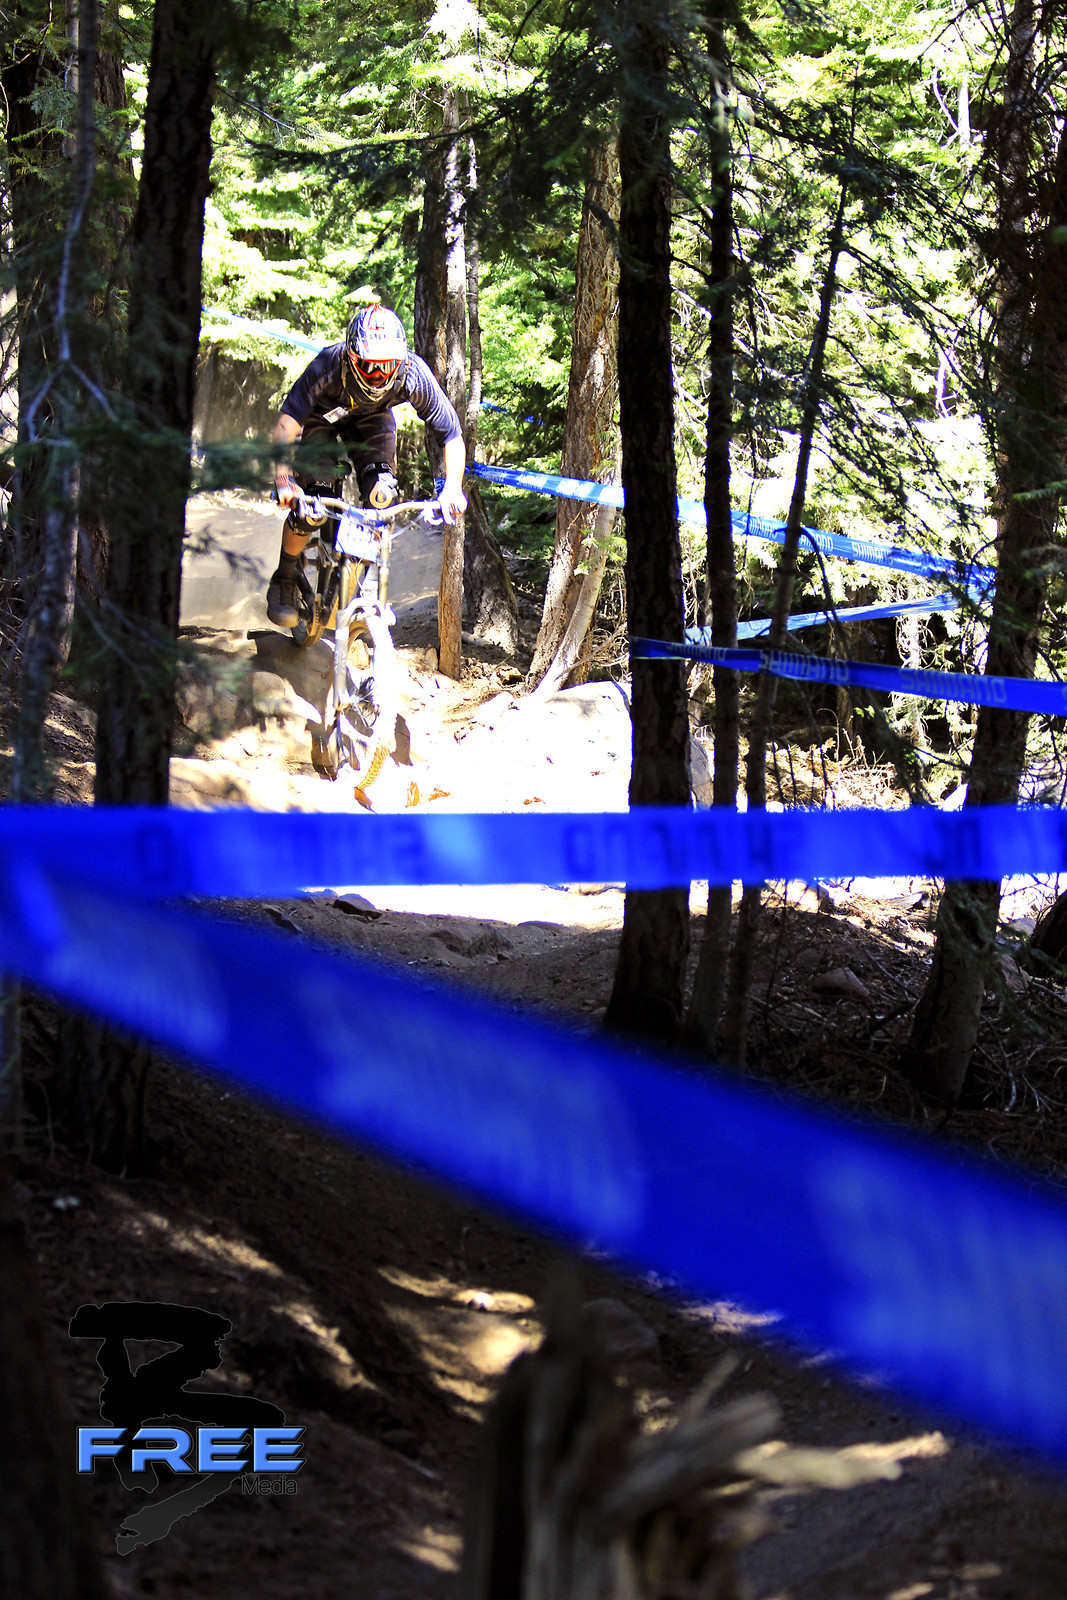 done10 1 - GnarHuck - Mountain Biking Pictures - Vital MTB